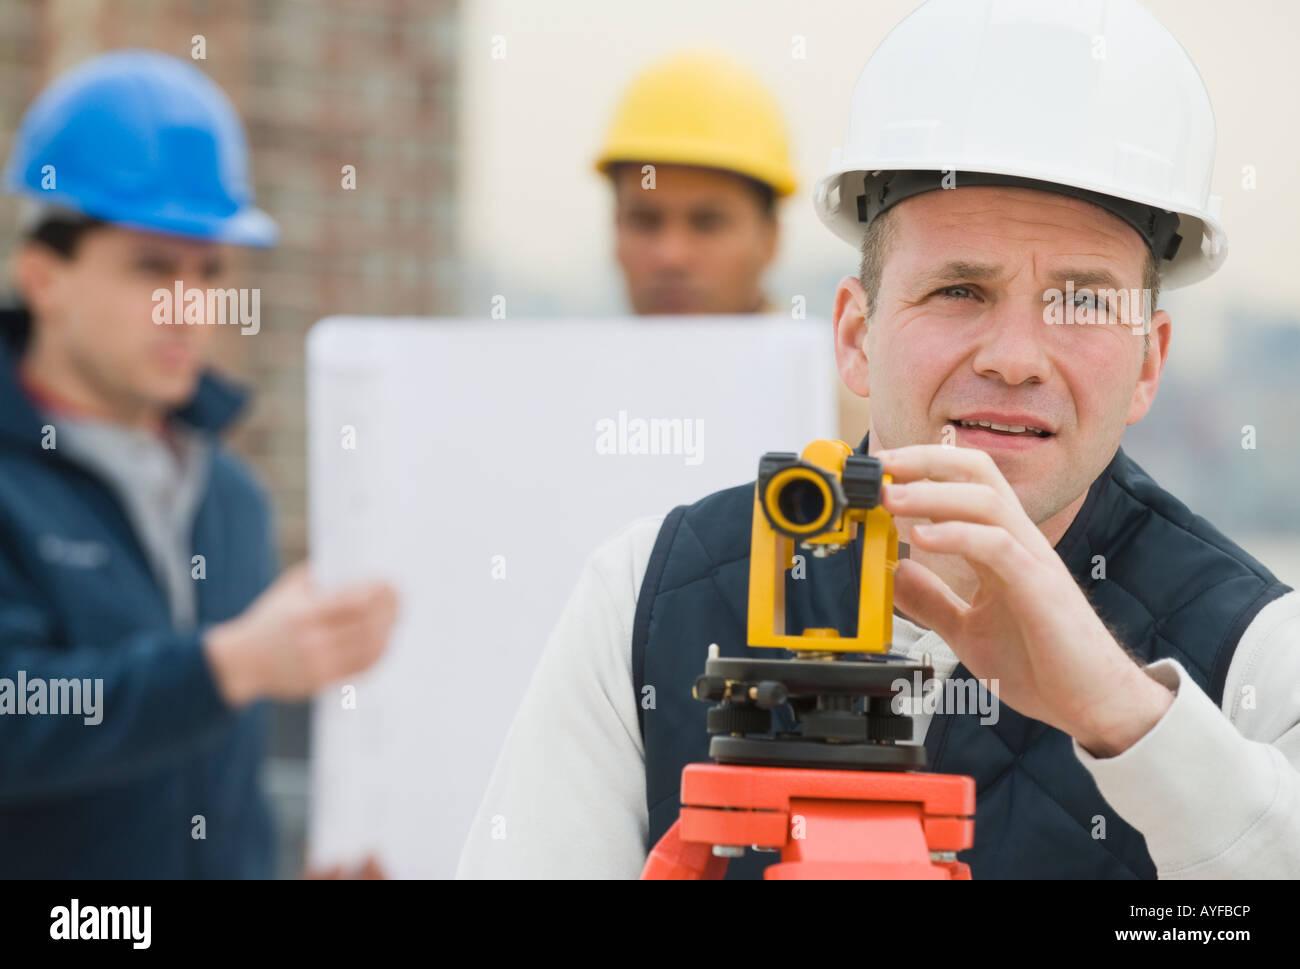 Male surveyor looking through measuring device - Stock Image